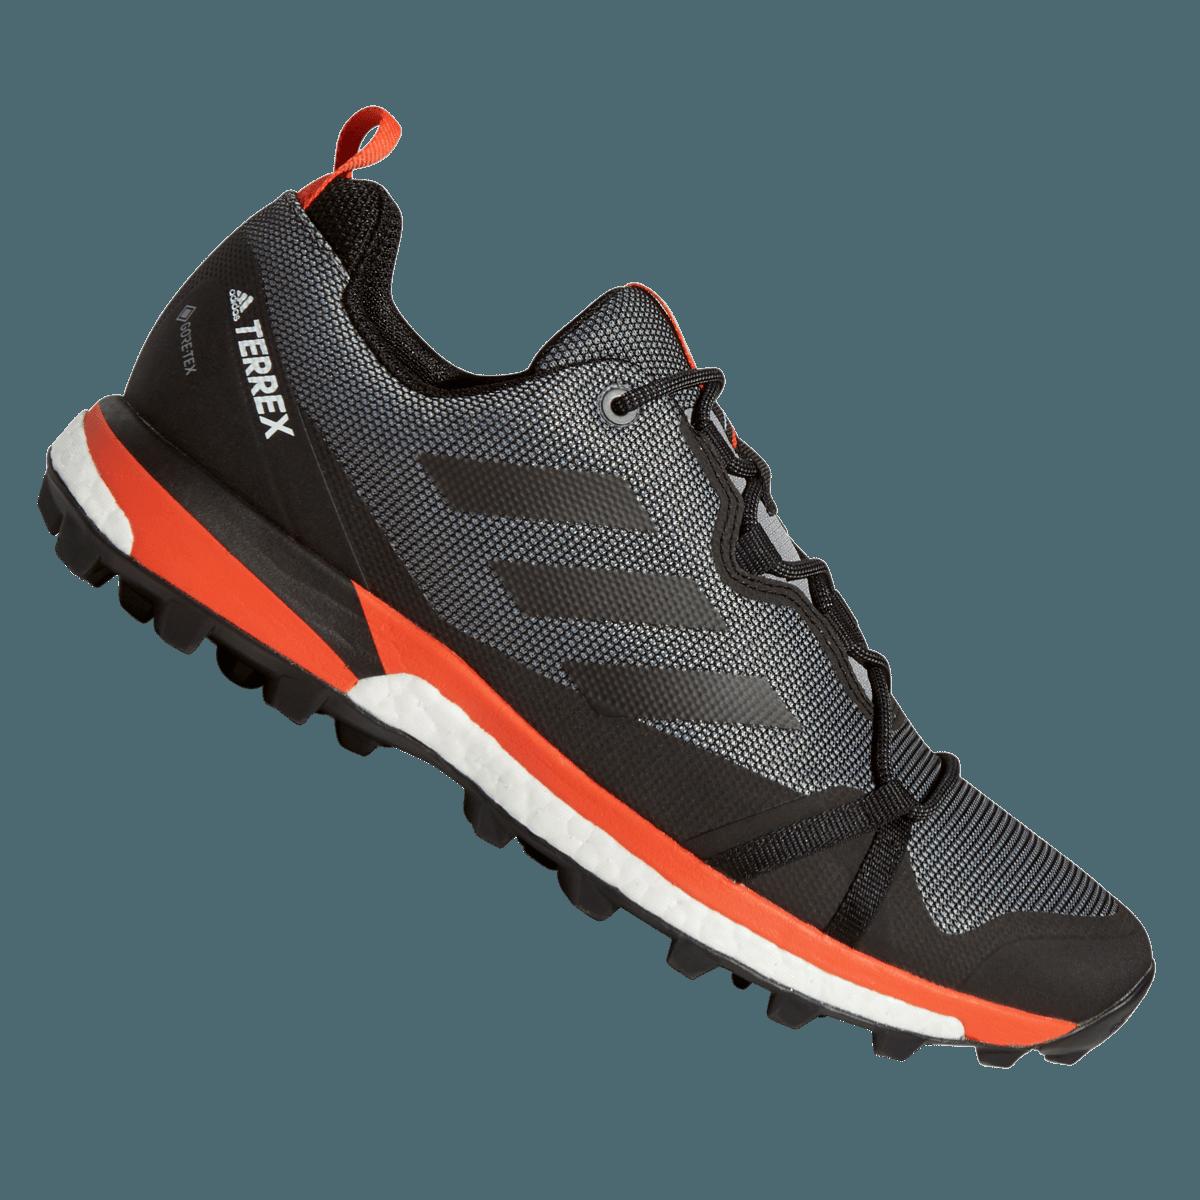 Adidas TERREX Skychaser GTX ab € 111,79 | Preisvergleich bei